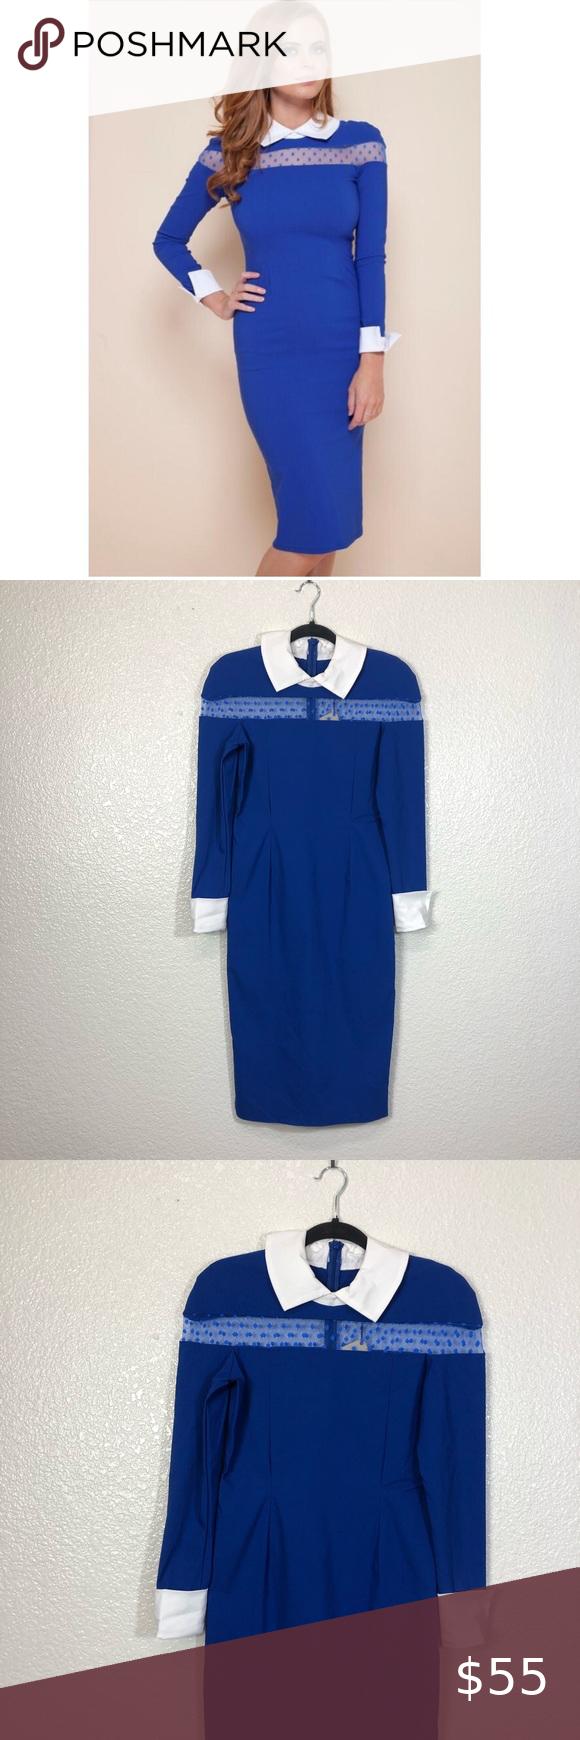 Tempest Lily Cobalt Blue Long Sleeve Retro Dress T